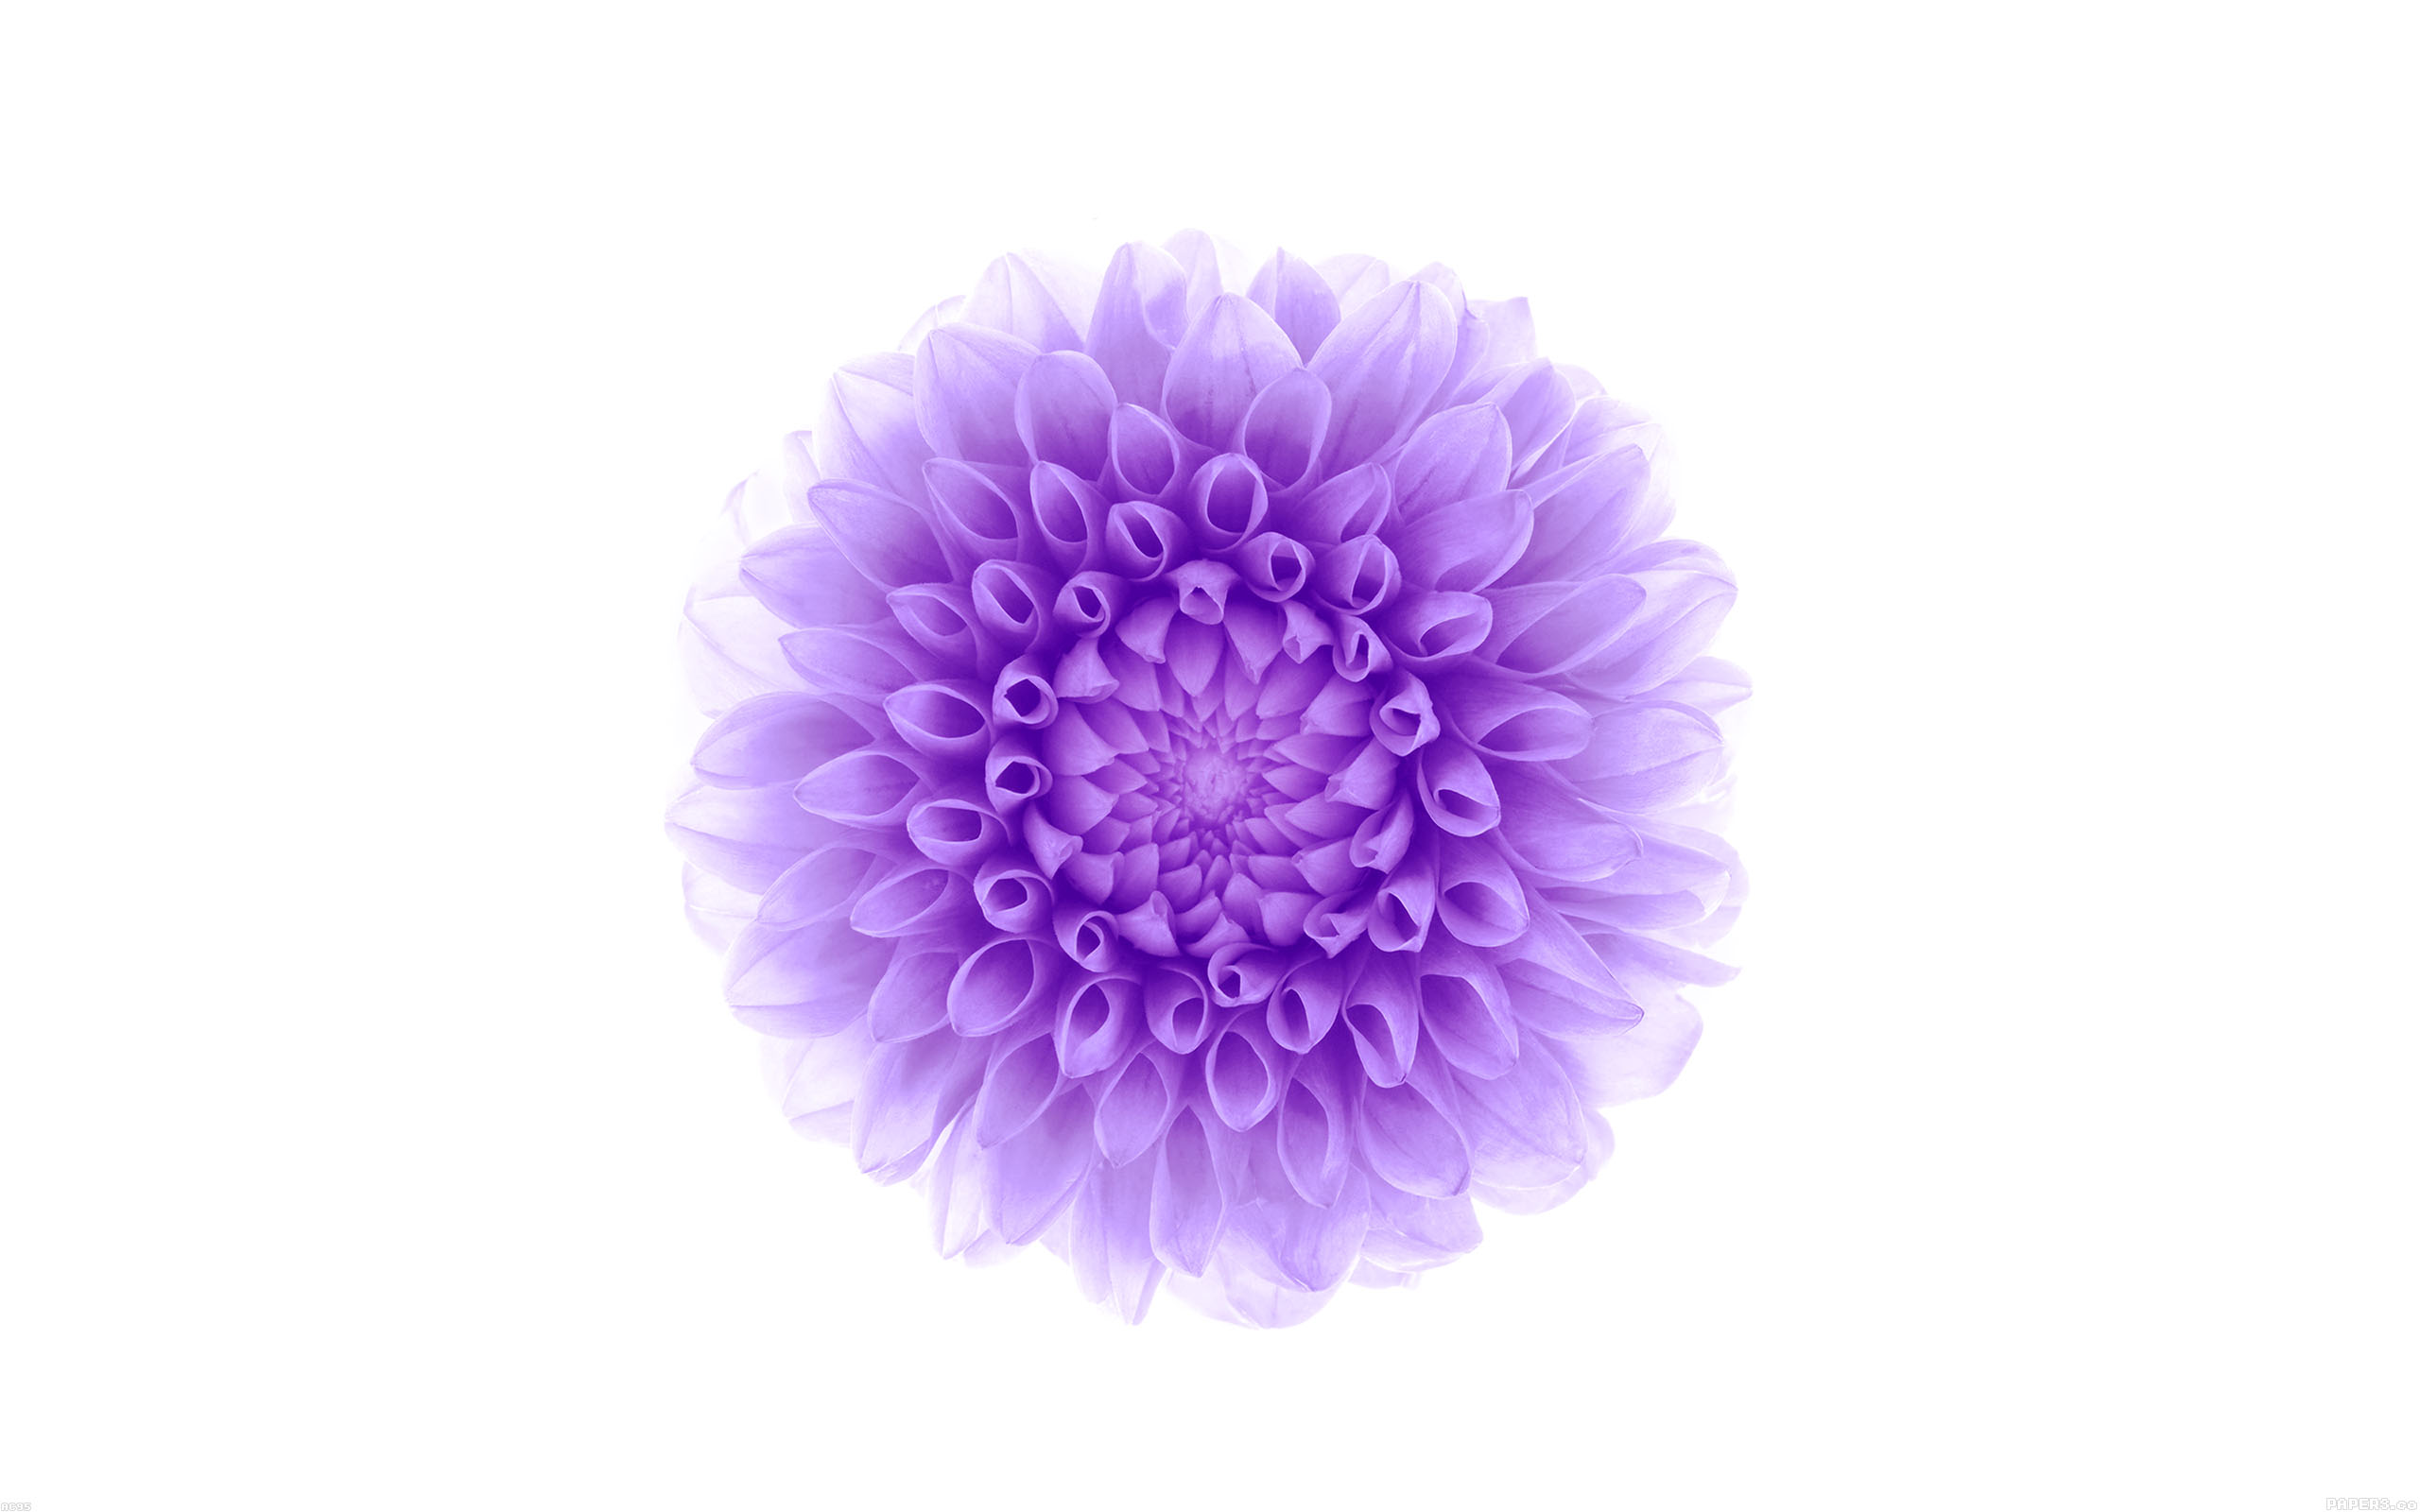 Ac95 Wallpaper Apple Iphone6 Plus Ios8 Flower Purple Wallpaper